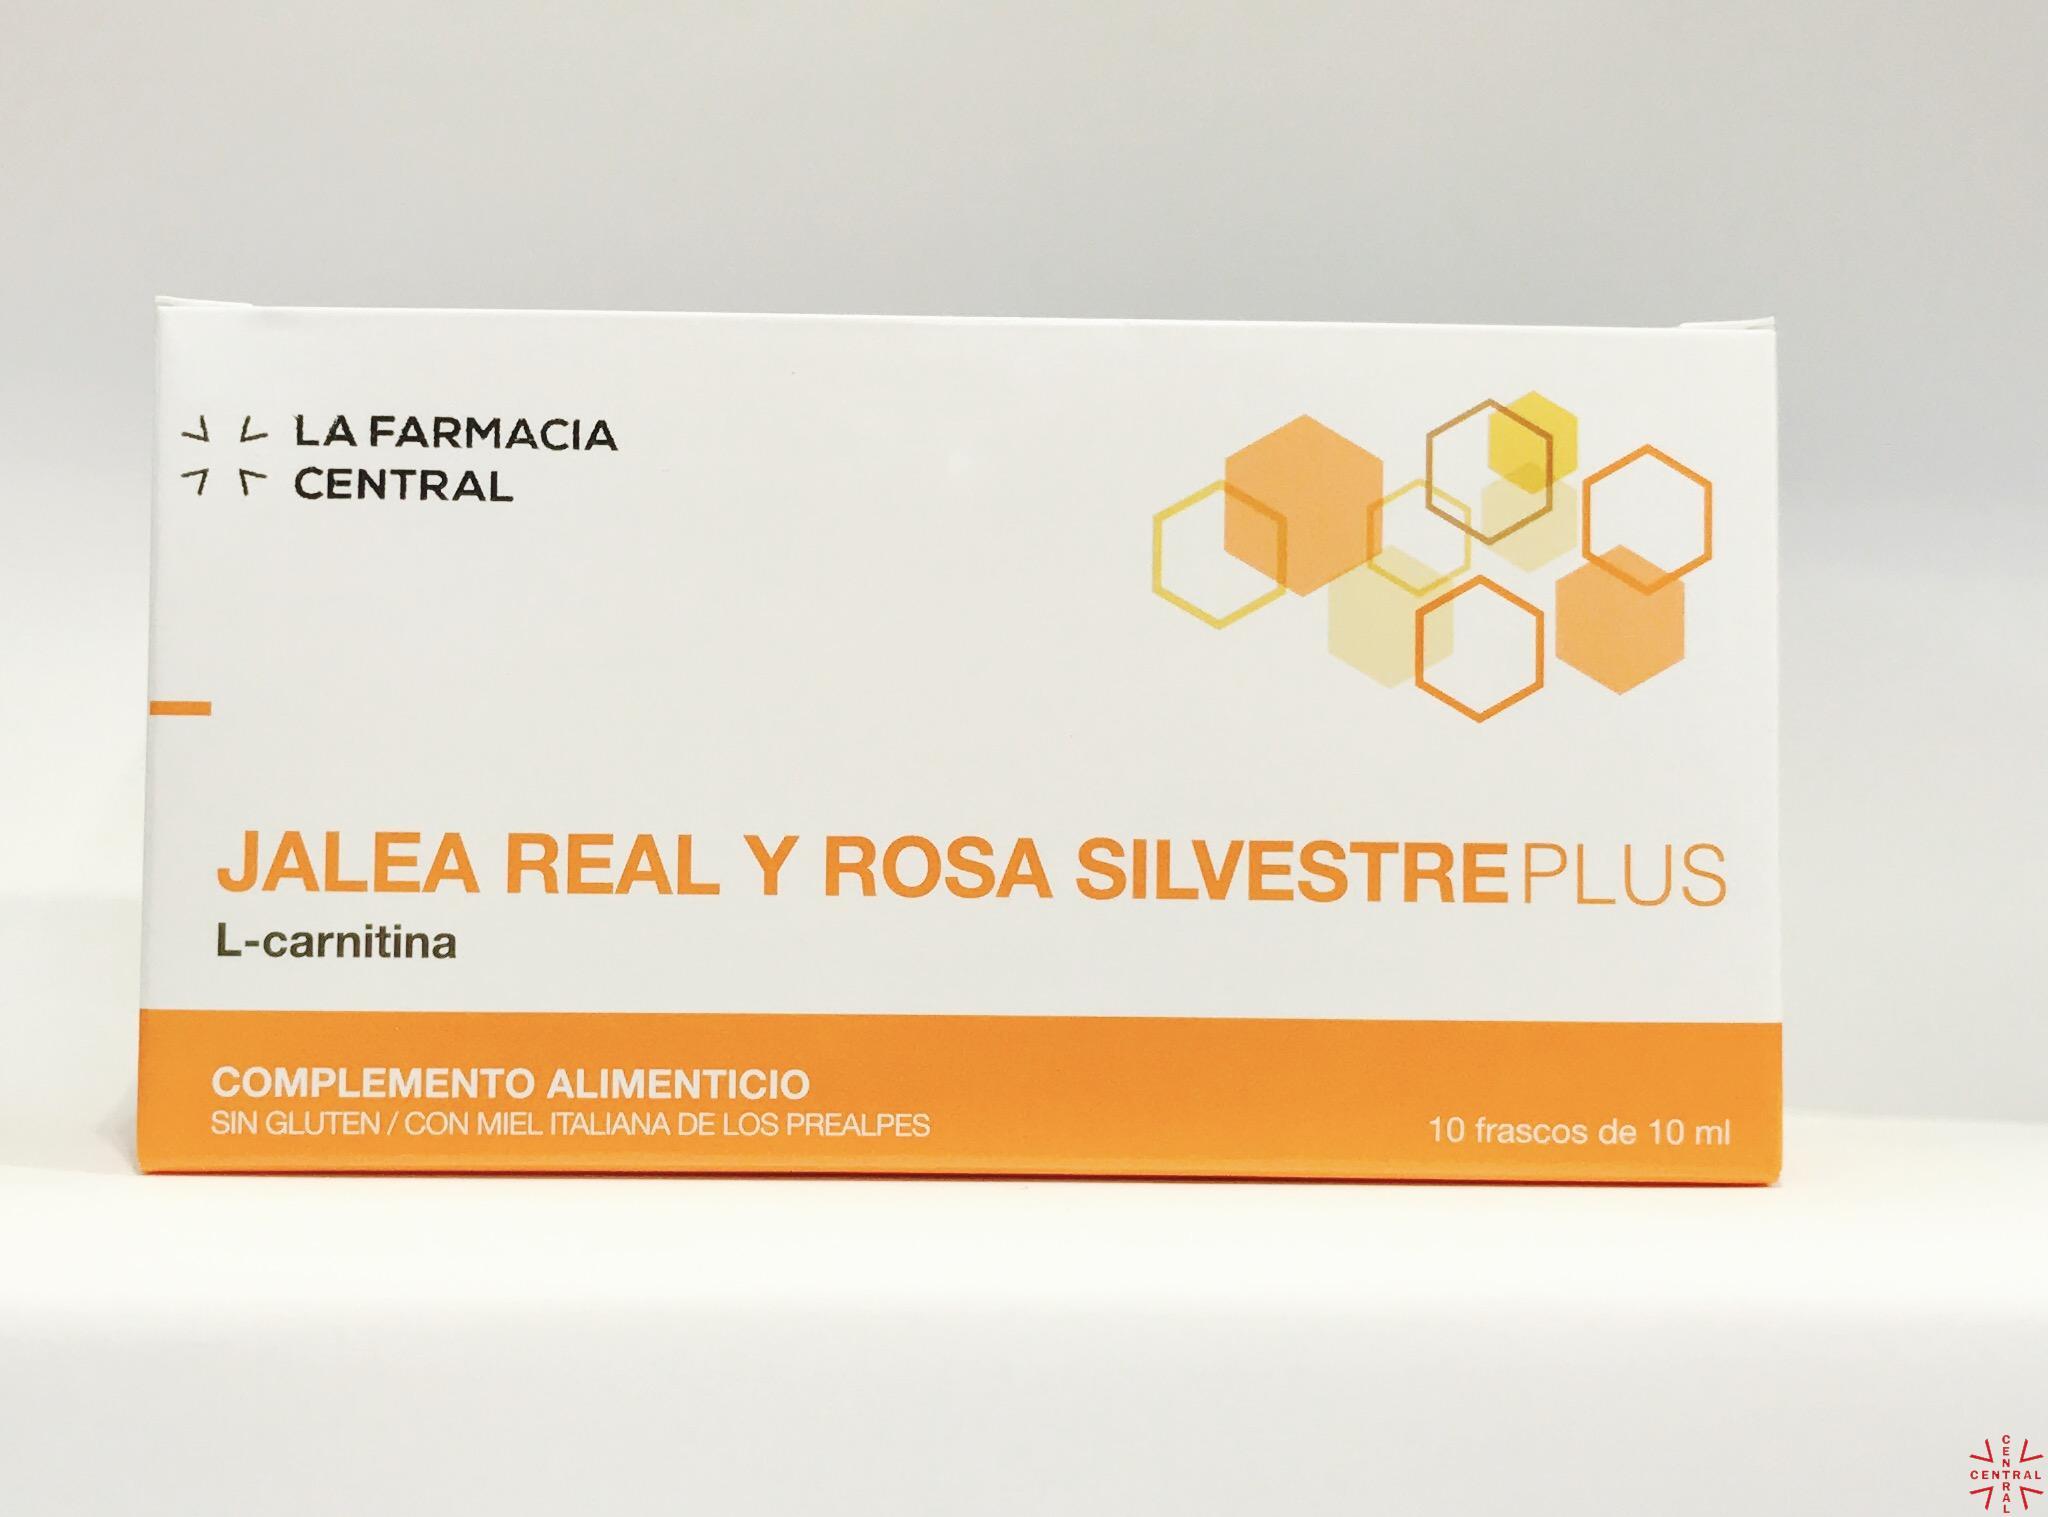 LFC Jalea Real y Rosa Silvestre plus 10 frascos